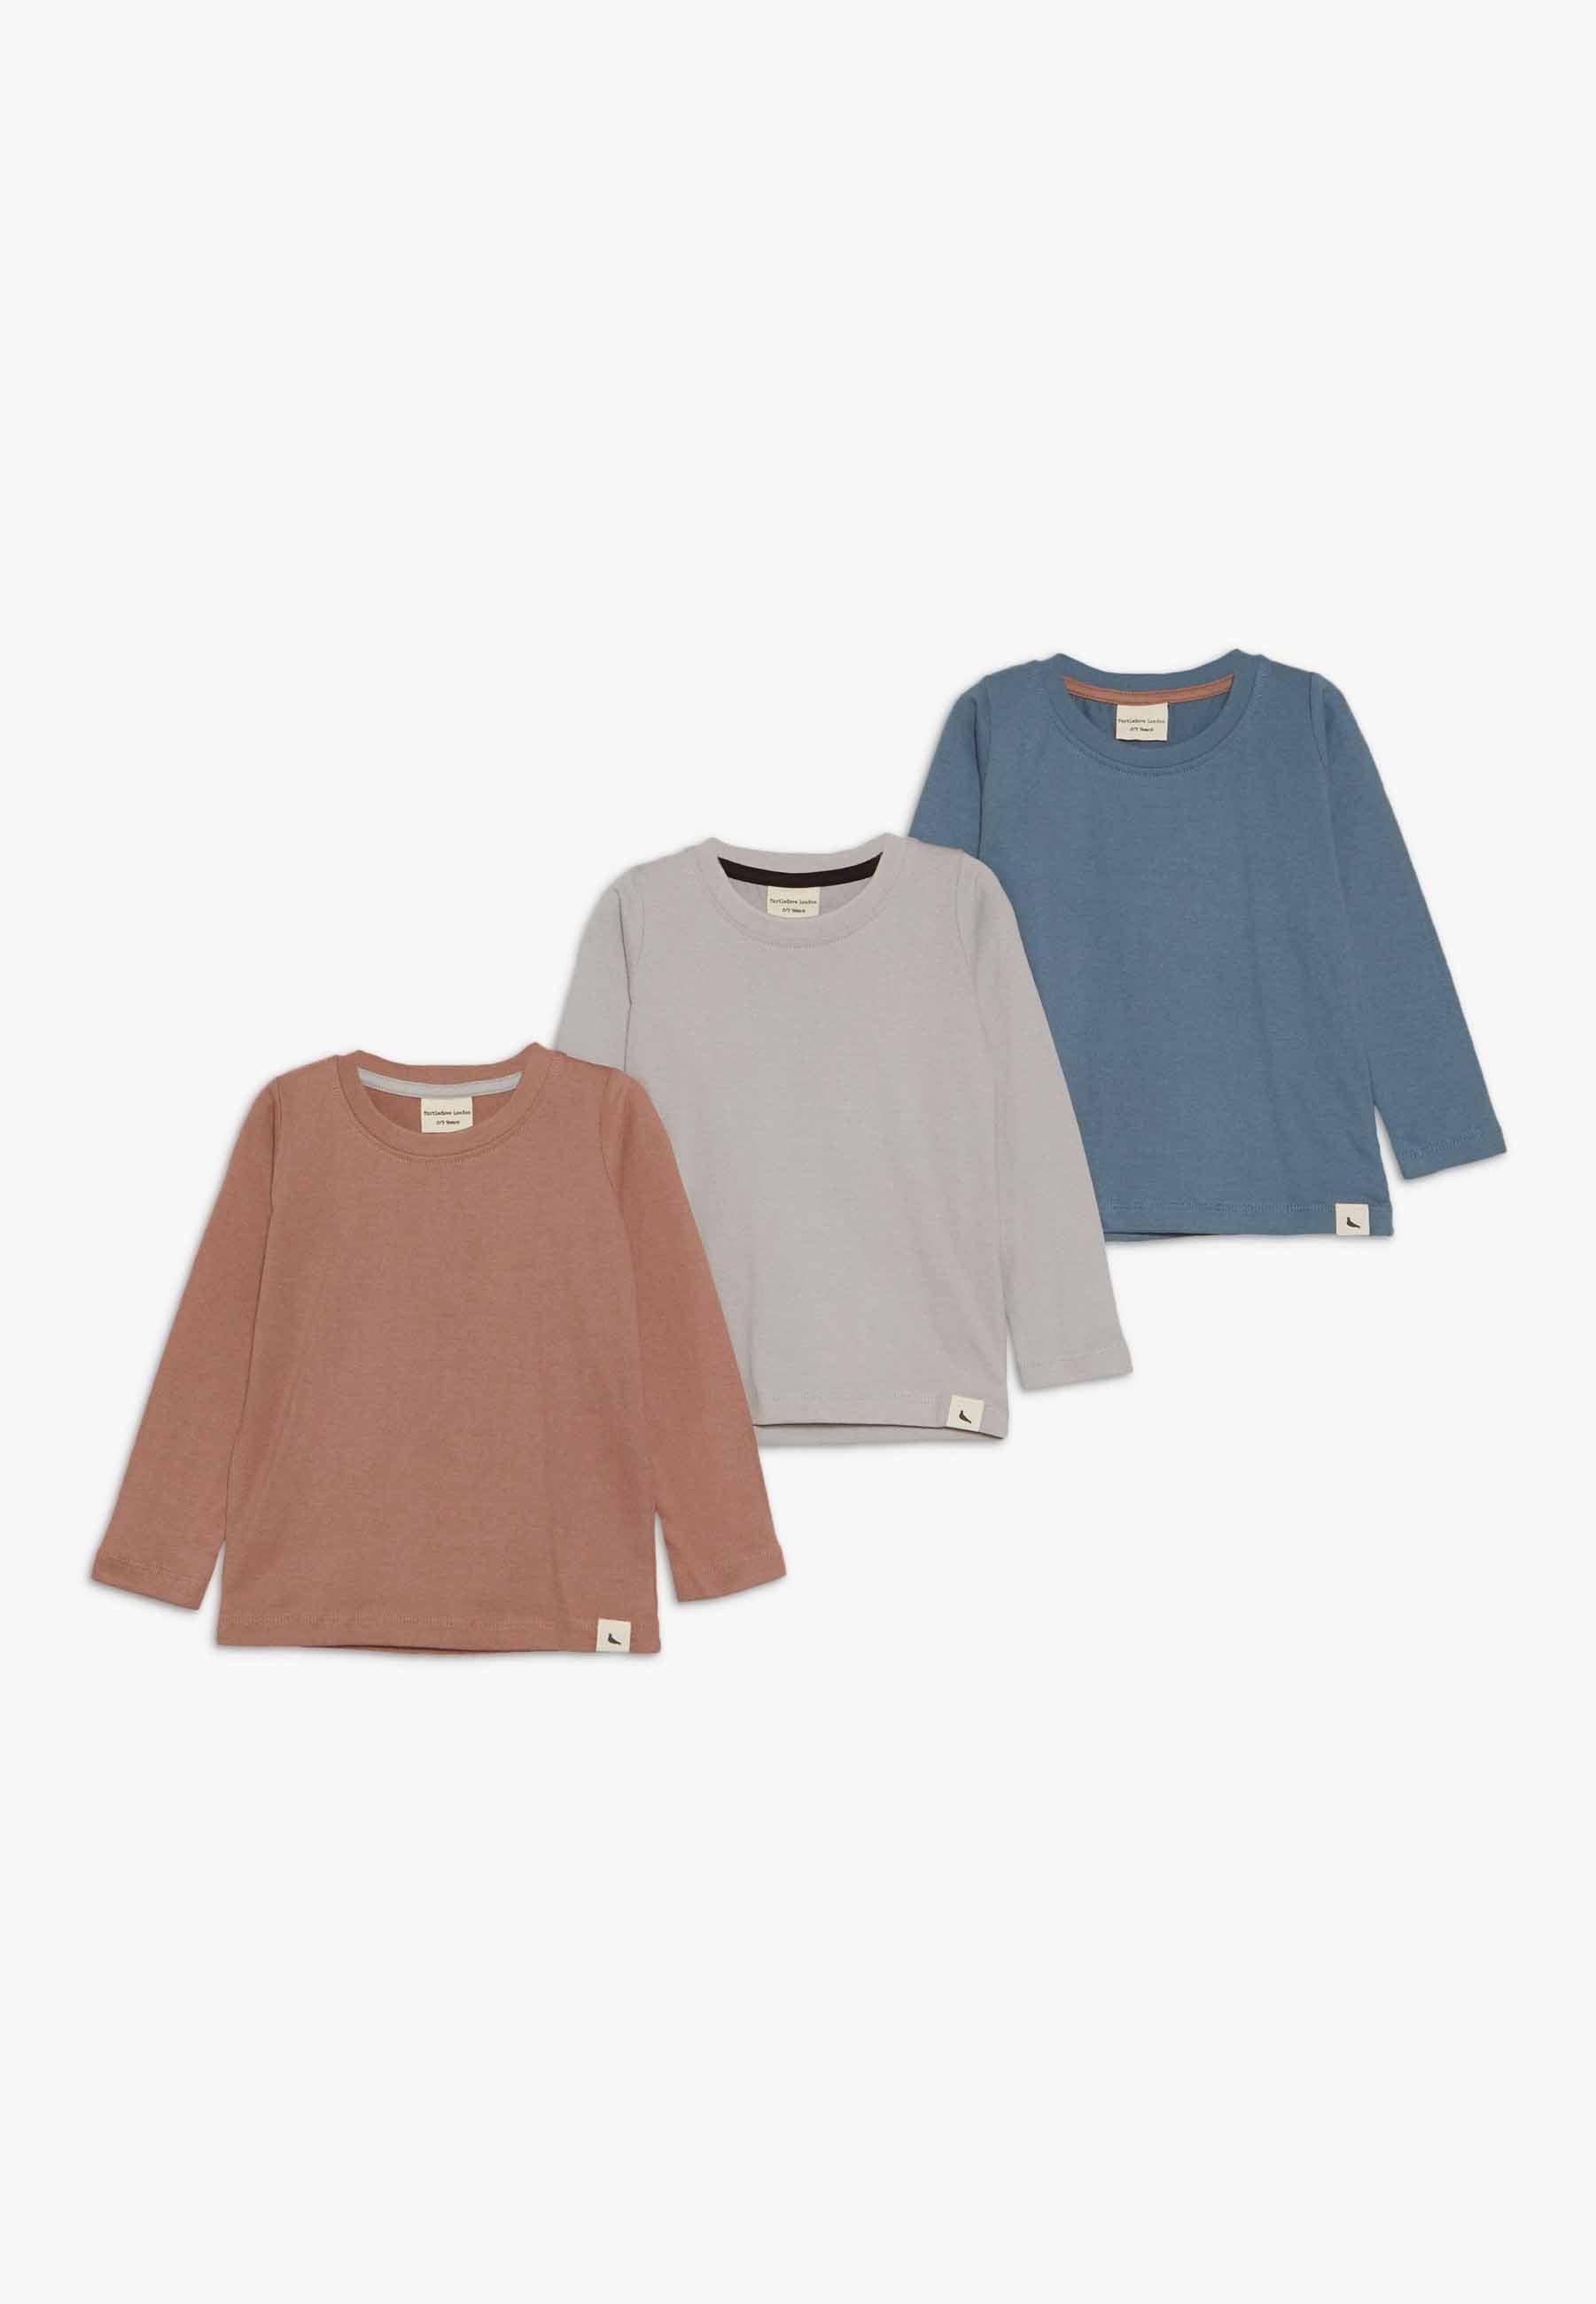 Buy Wholesale Turtledove LAYERING TOP 3 PACK - Long sleeved top - grey/brick/denim   kids's clothing 2020 zK8M2